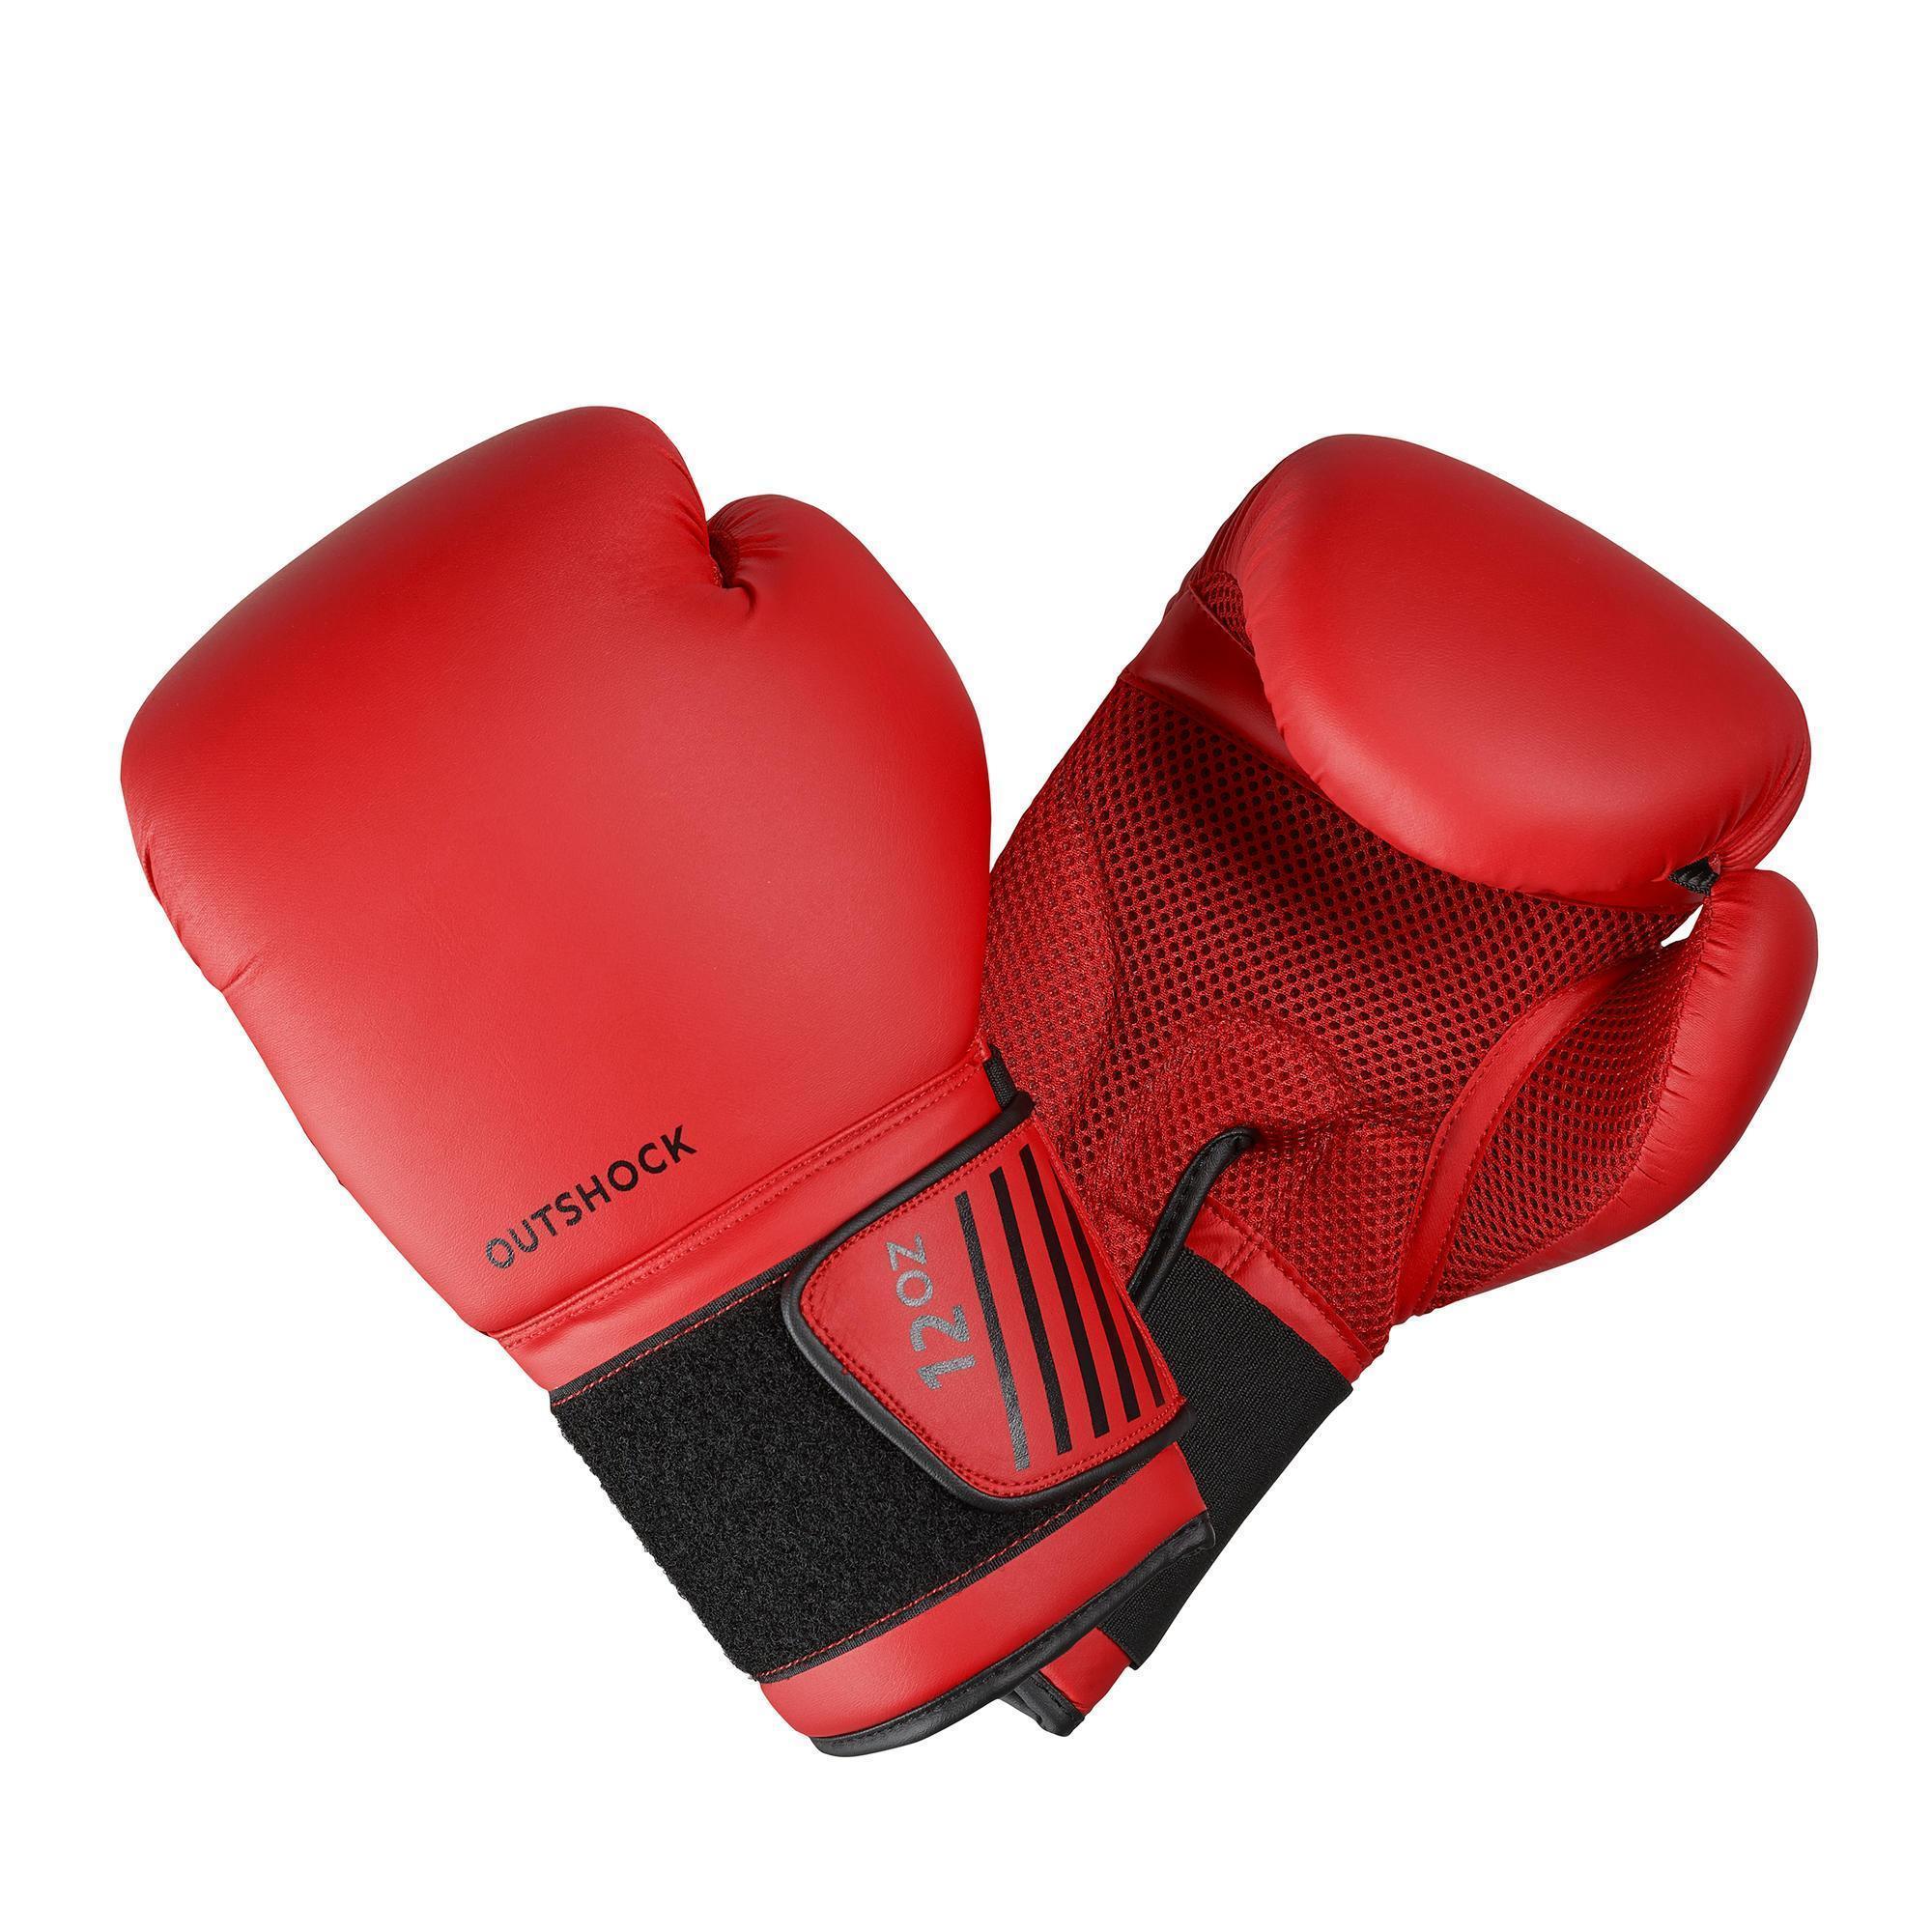 Картинки боксерские перчатки бойбо, печали грусти